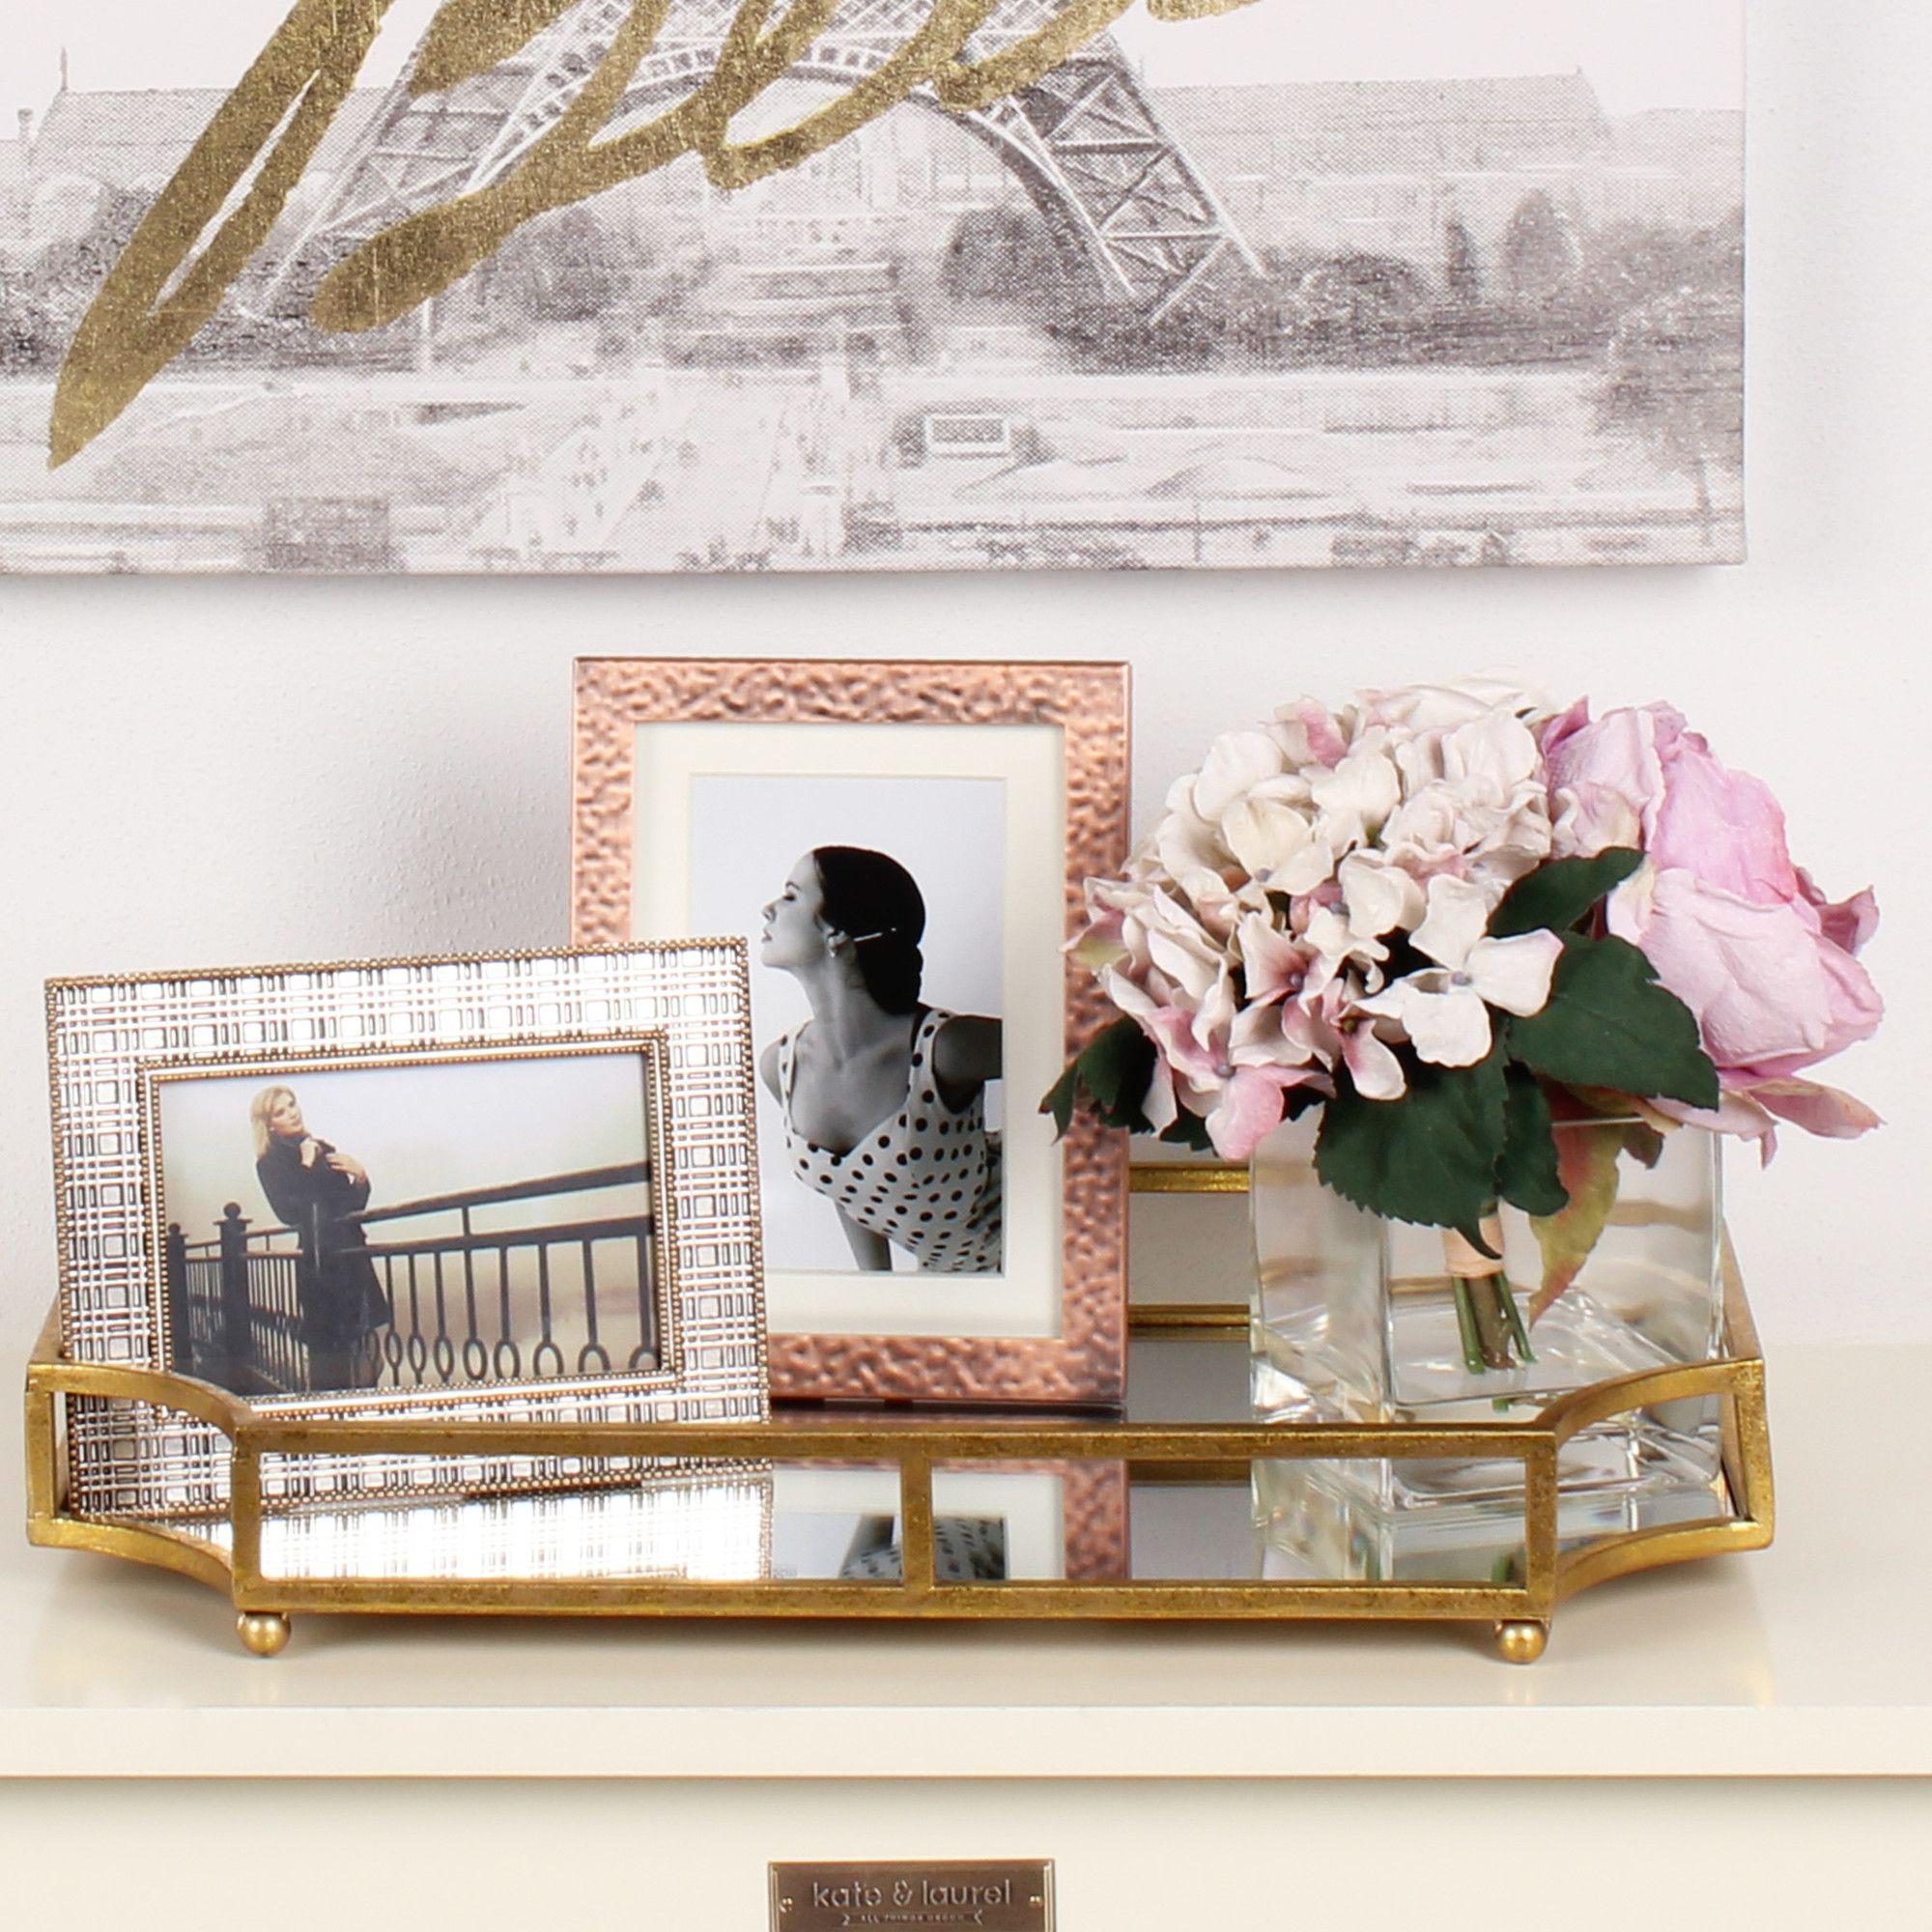 Ciel Metal Mirrored Ornate Decorative Tray Products Decoracion